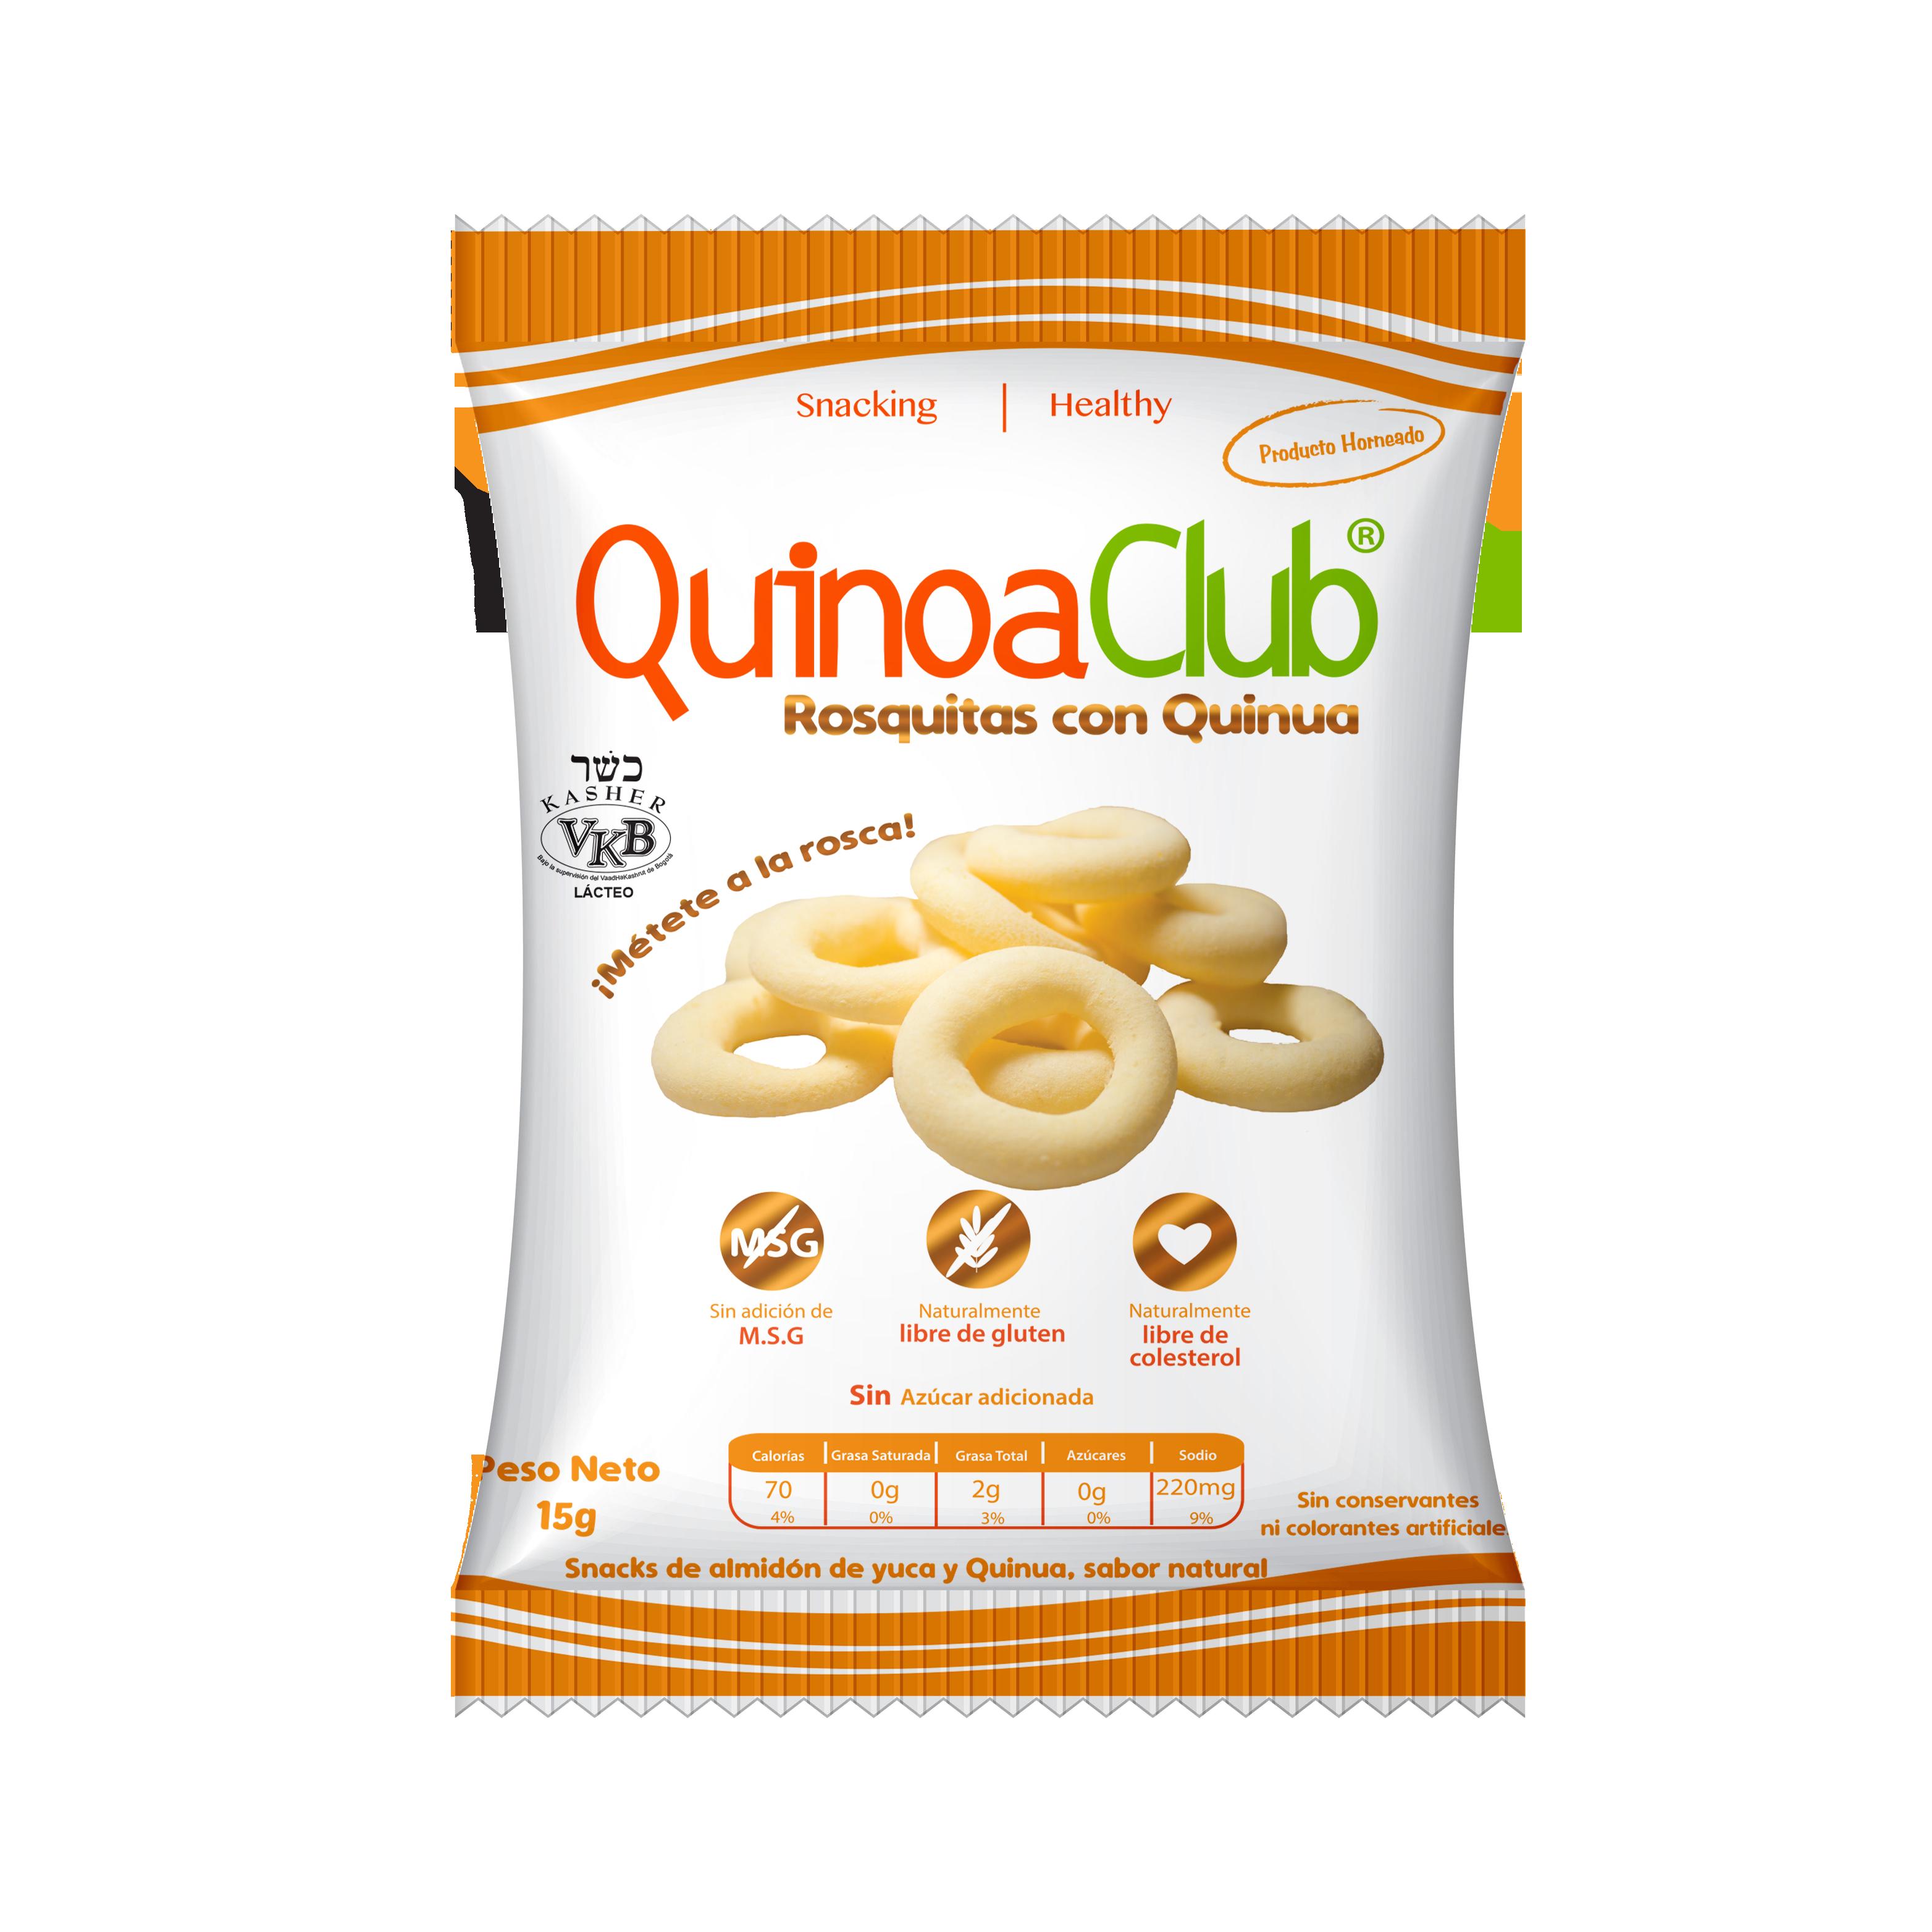 Rosquitas con quinoa essencia tienda alimentos saludables for Club natura colchones